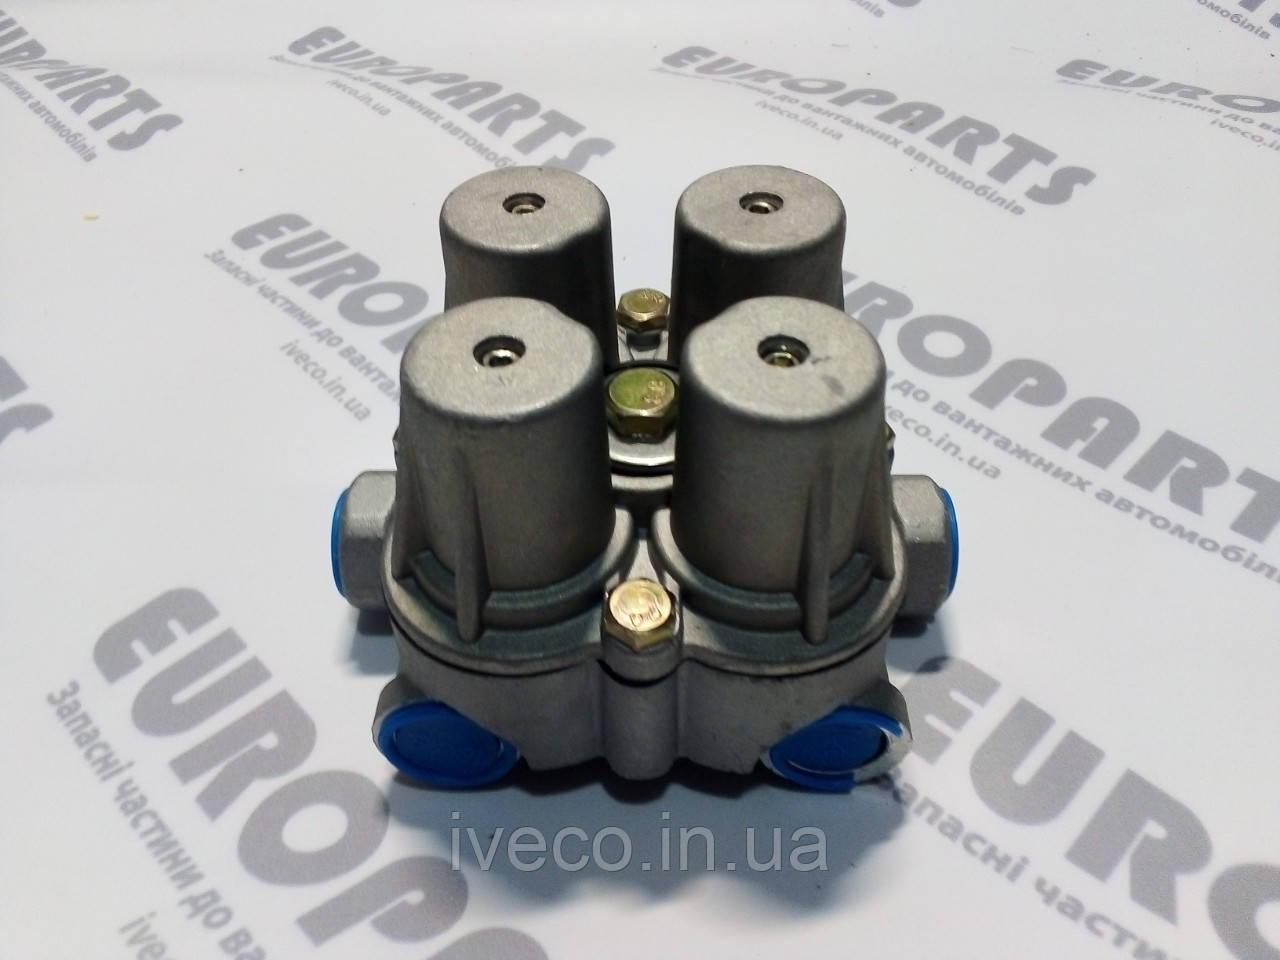 AE4168 Кран клапан защитный четырехконтурный 9347020400 1505397 DAF  AE4409 AE4428 9347020530